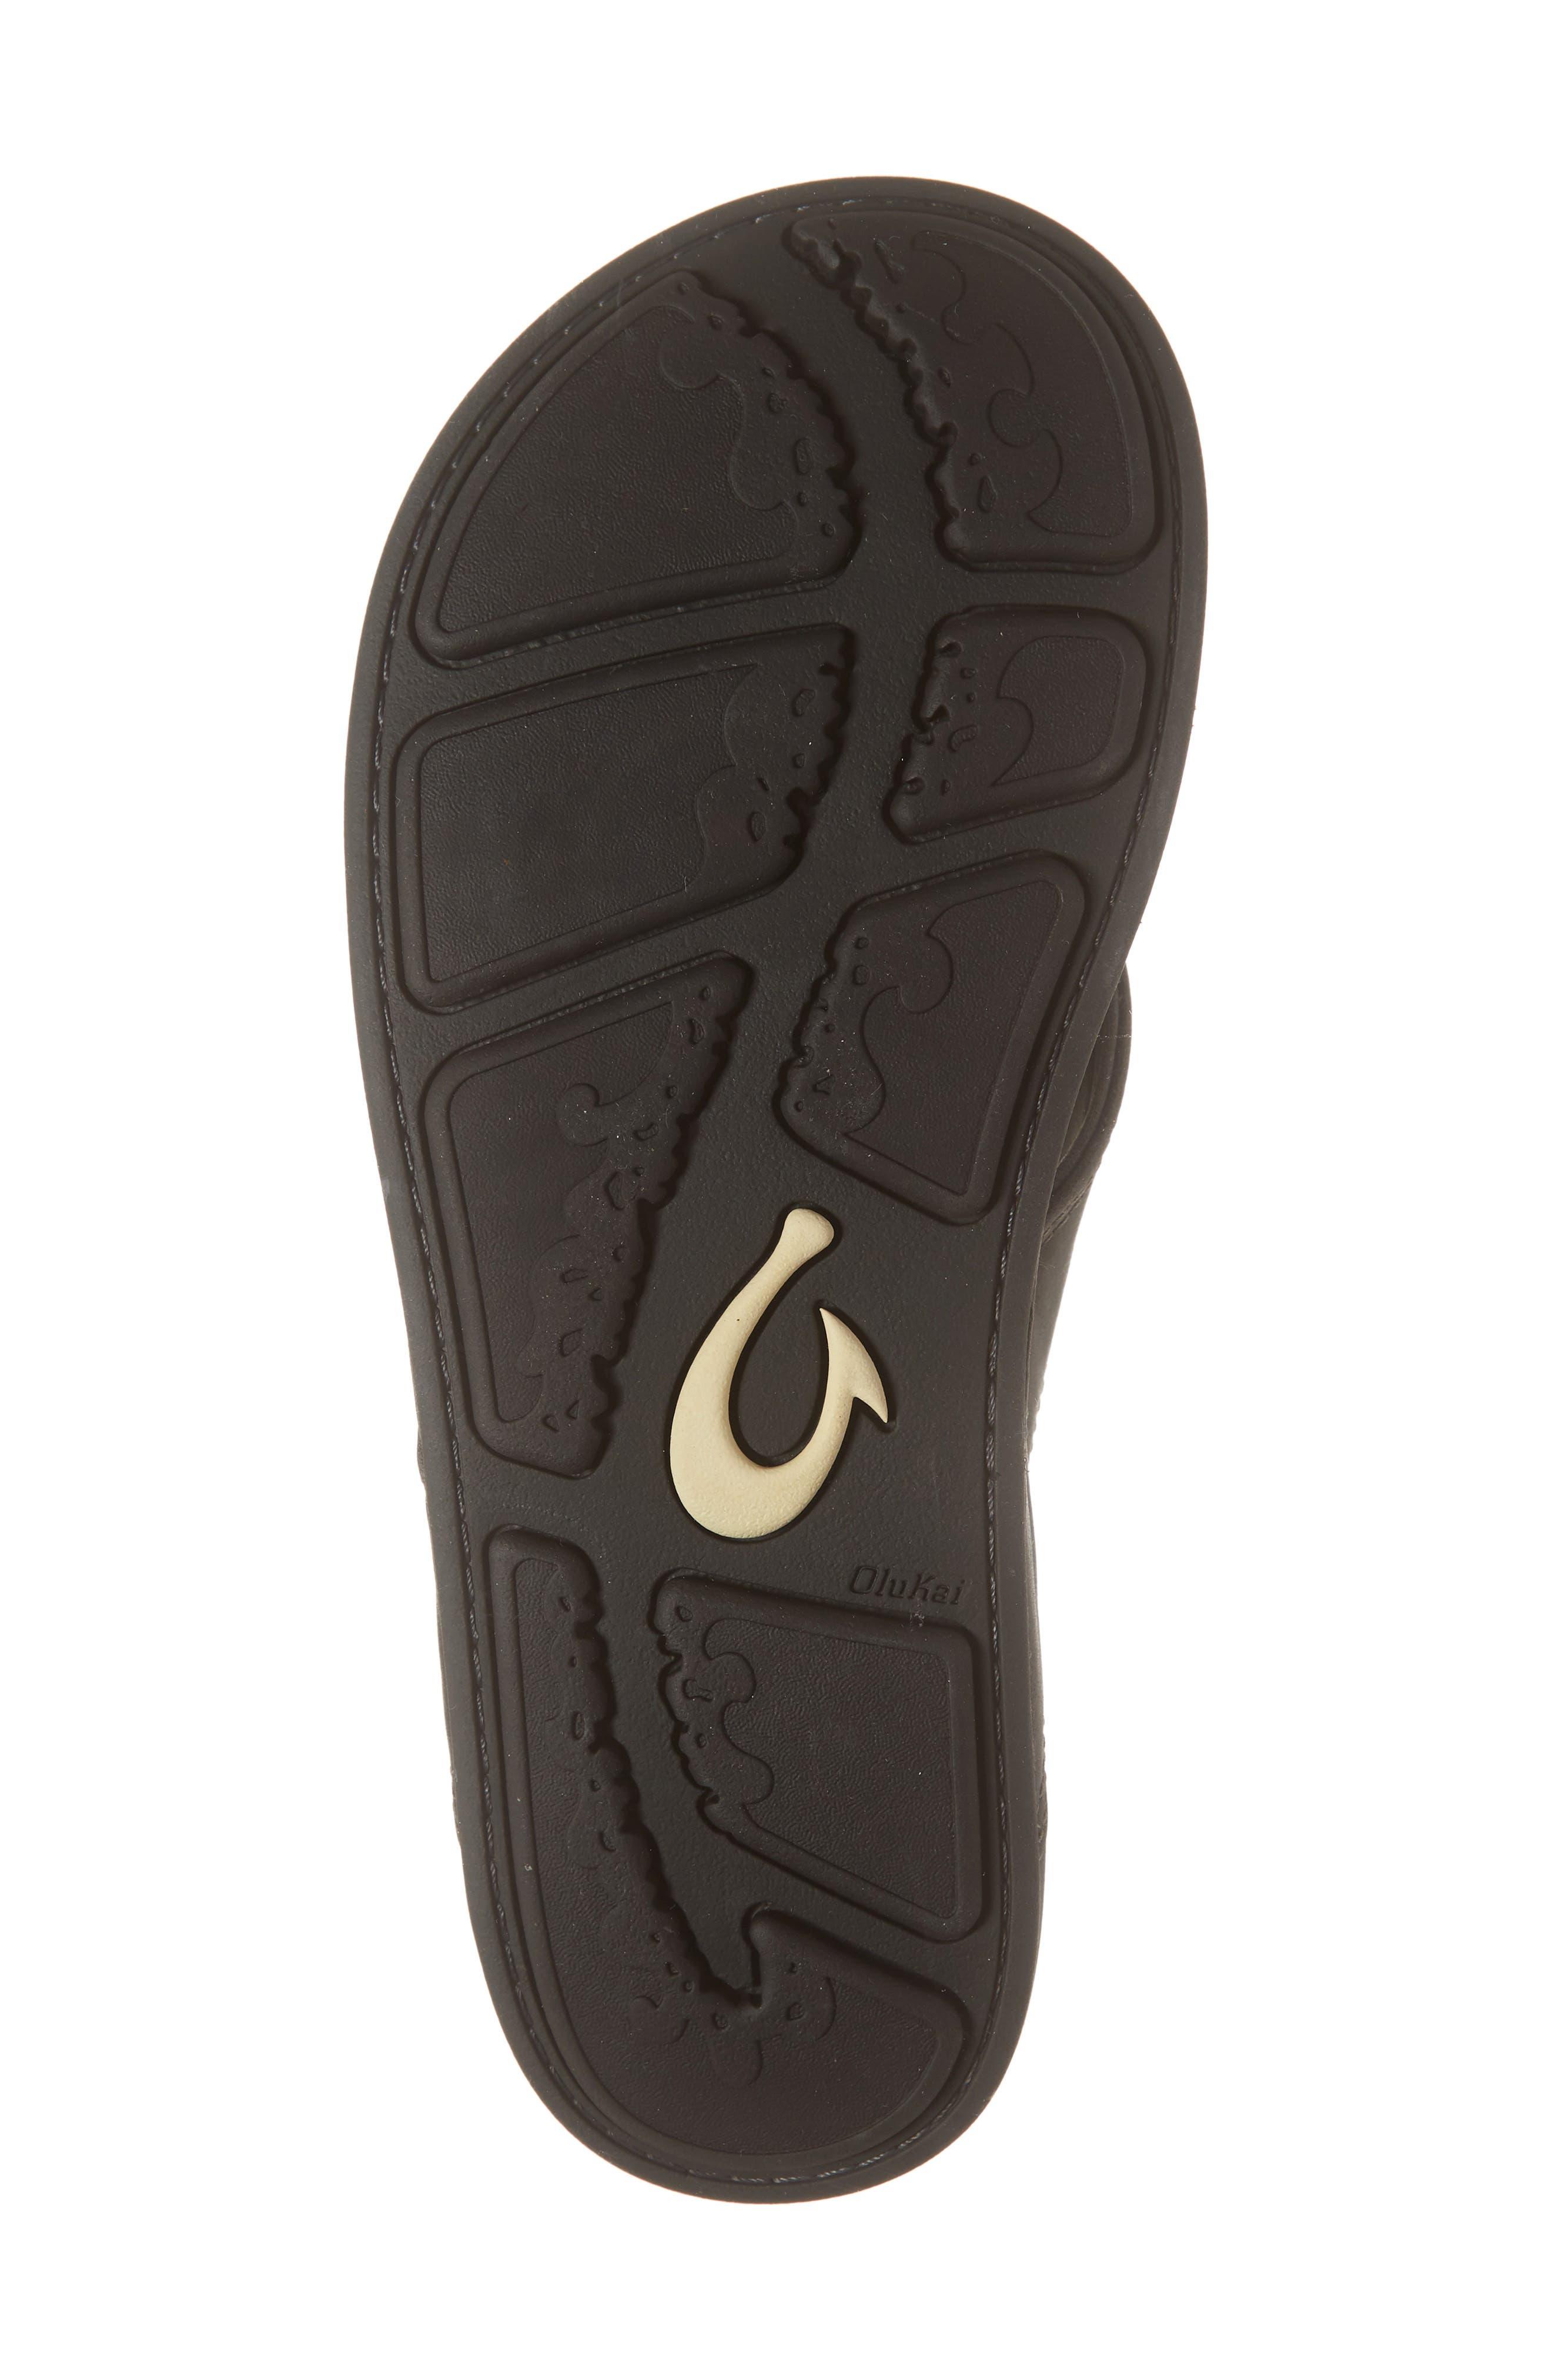 OLUKAI, 'Nui' Leather Flip Flop, Alternate thumbnail 6, color, LAVA ROCK LEATHER